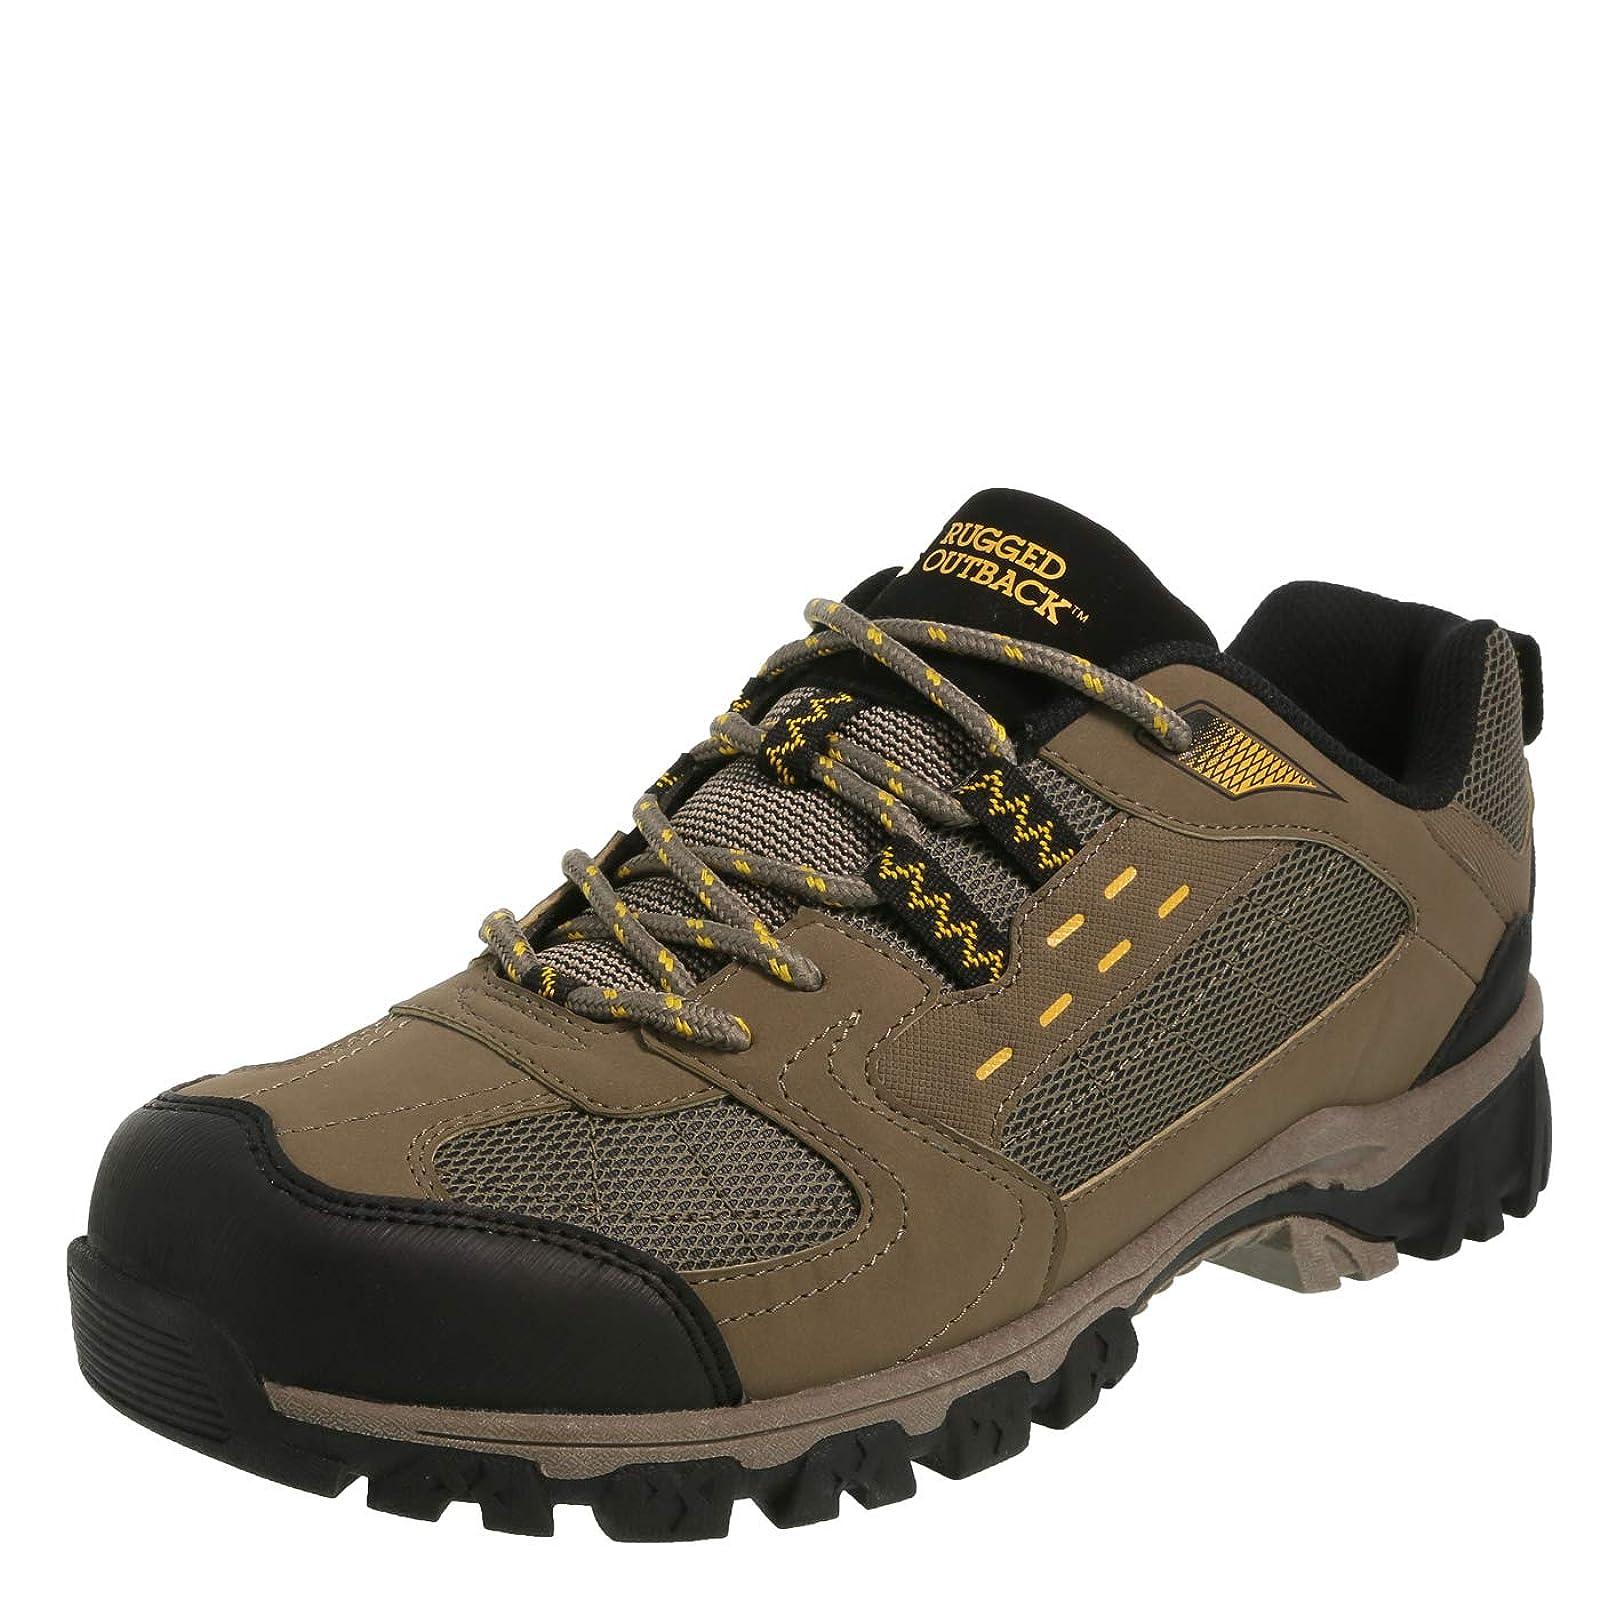 Rugged Outback Men's Dakota Hiker 9.5 B(M) US - 4